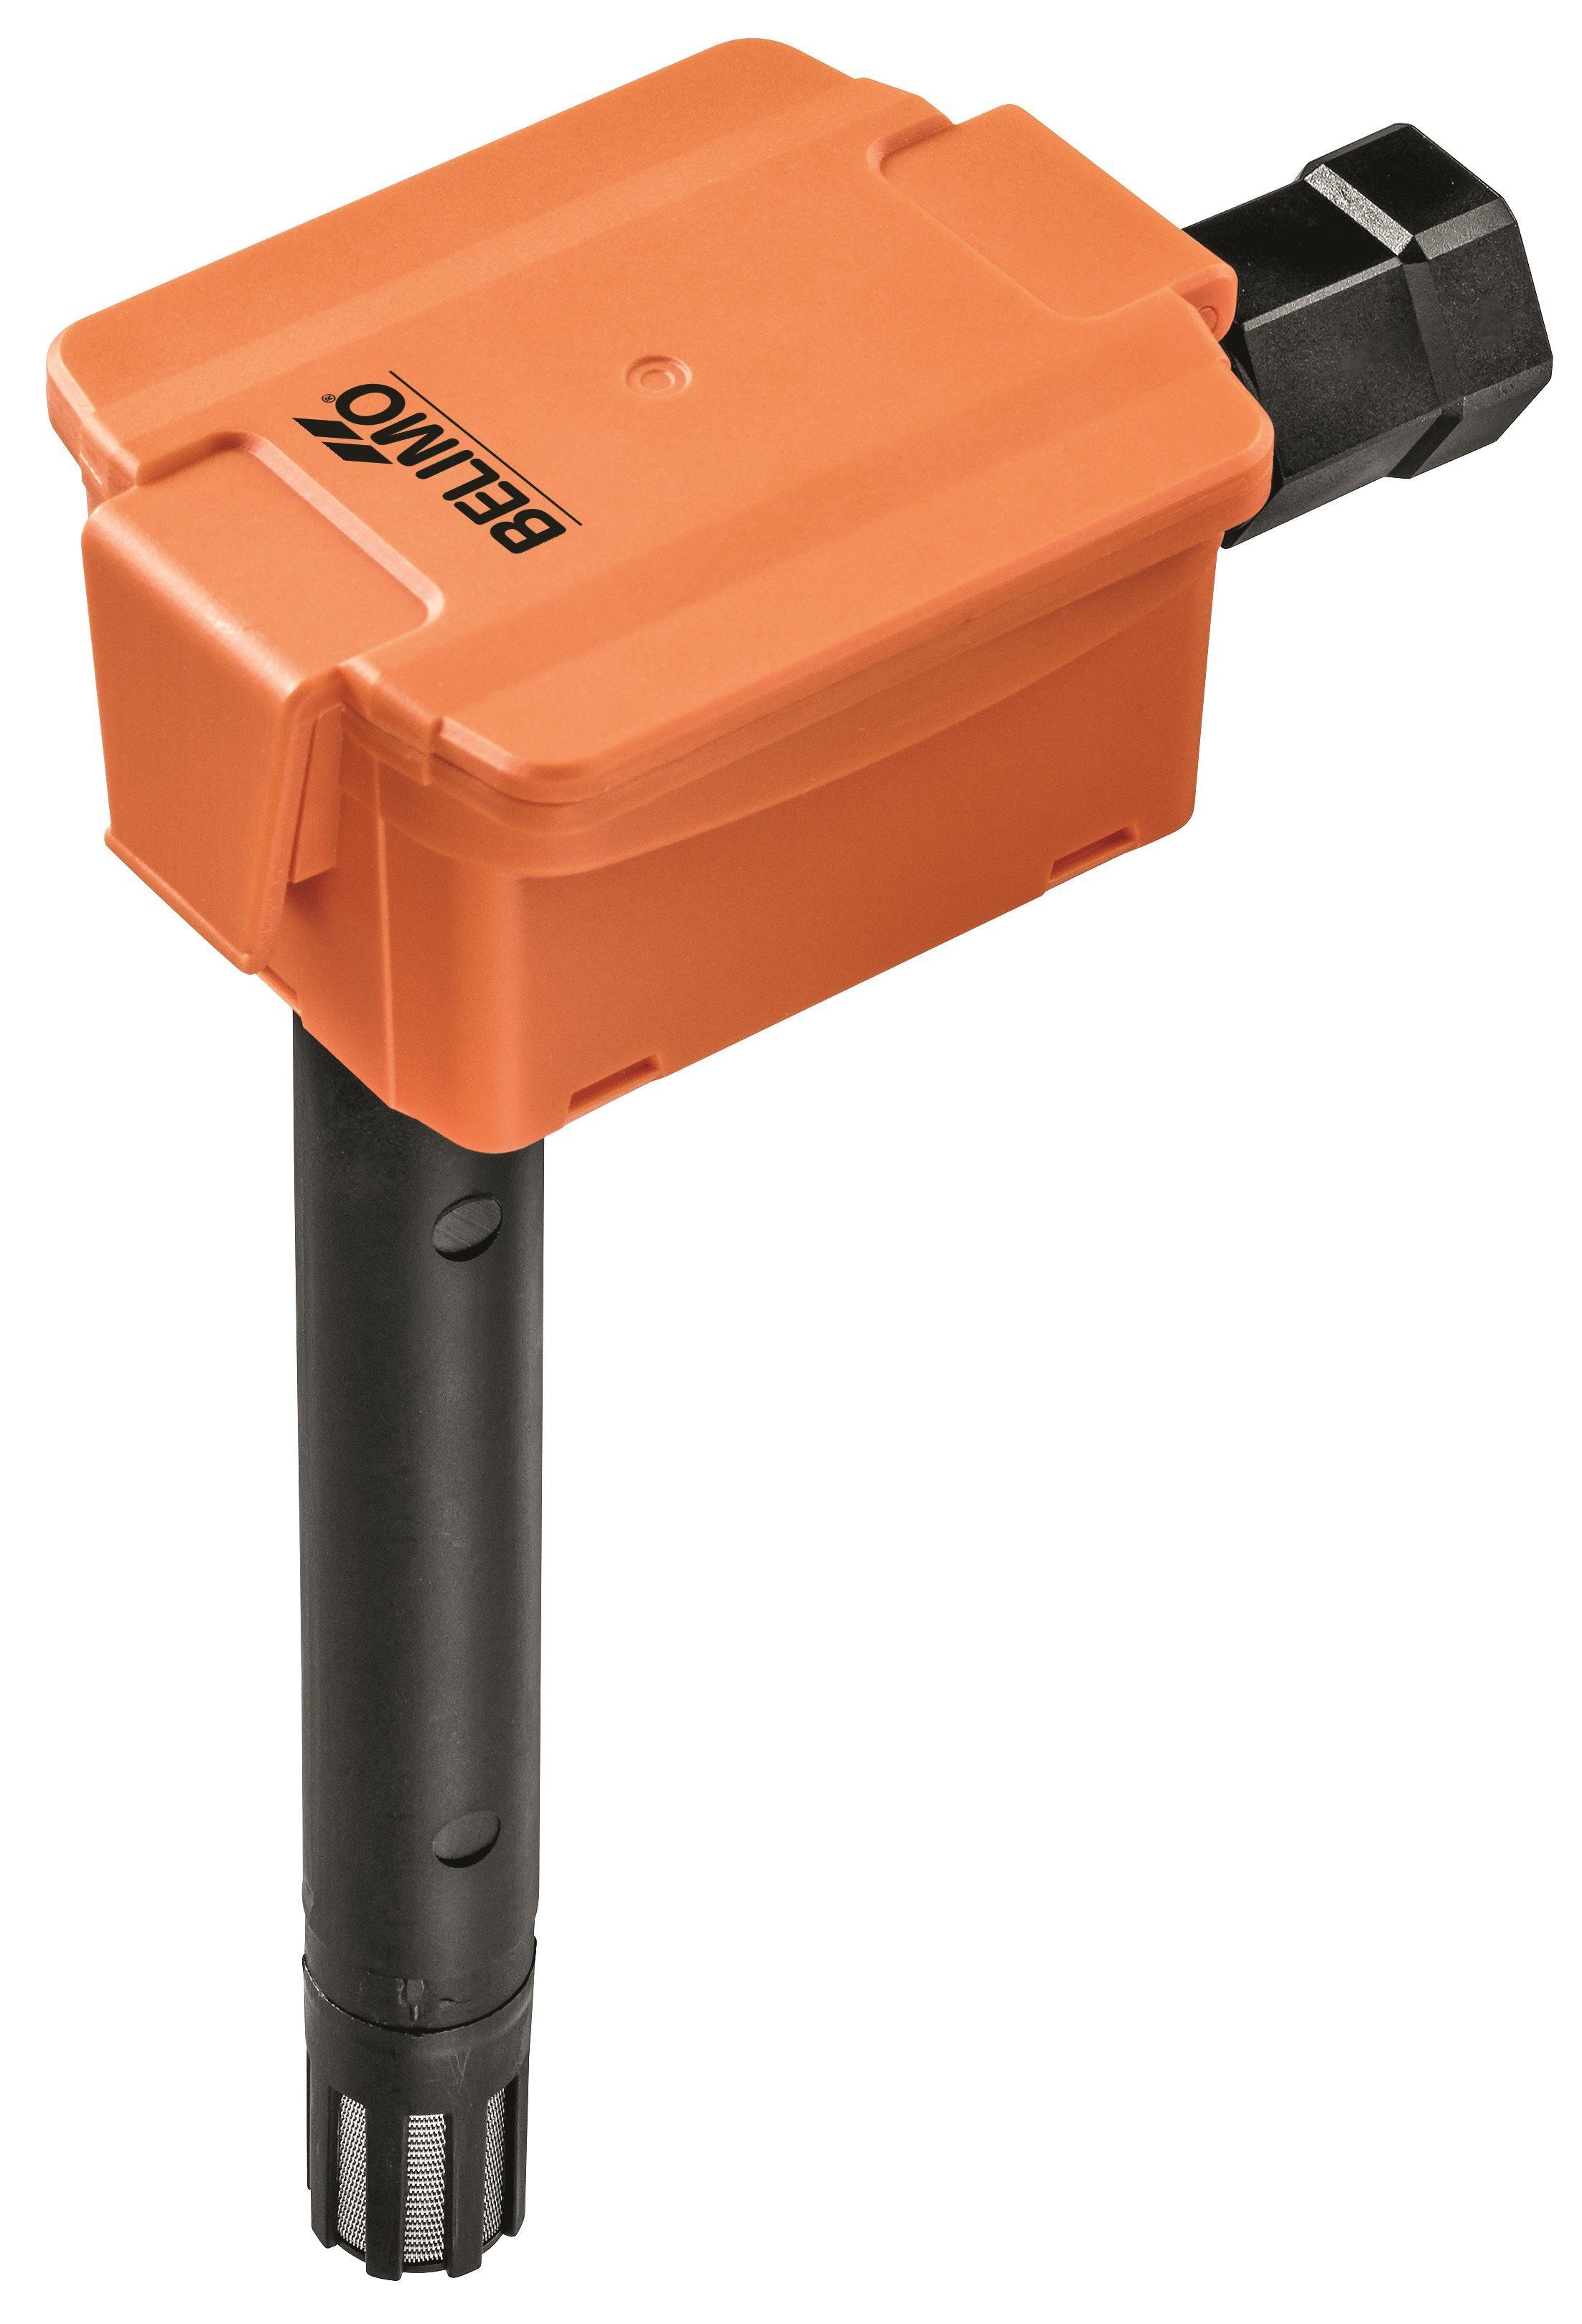 Belimo Belimo HVAC Sensors (2017) 22DTH-55M Sensors